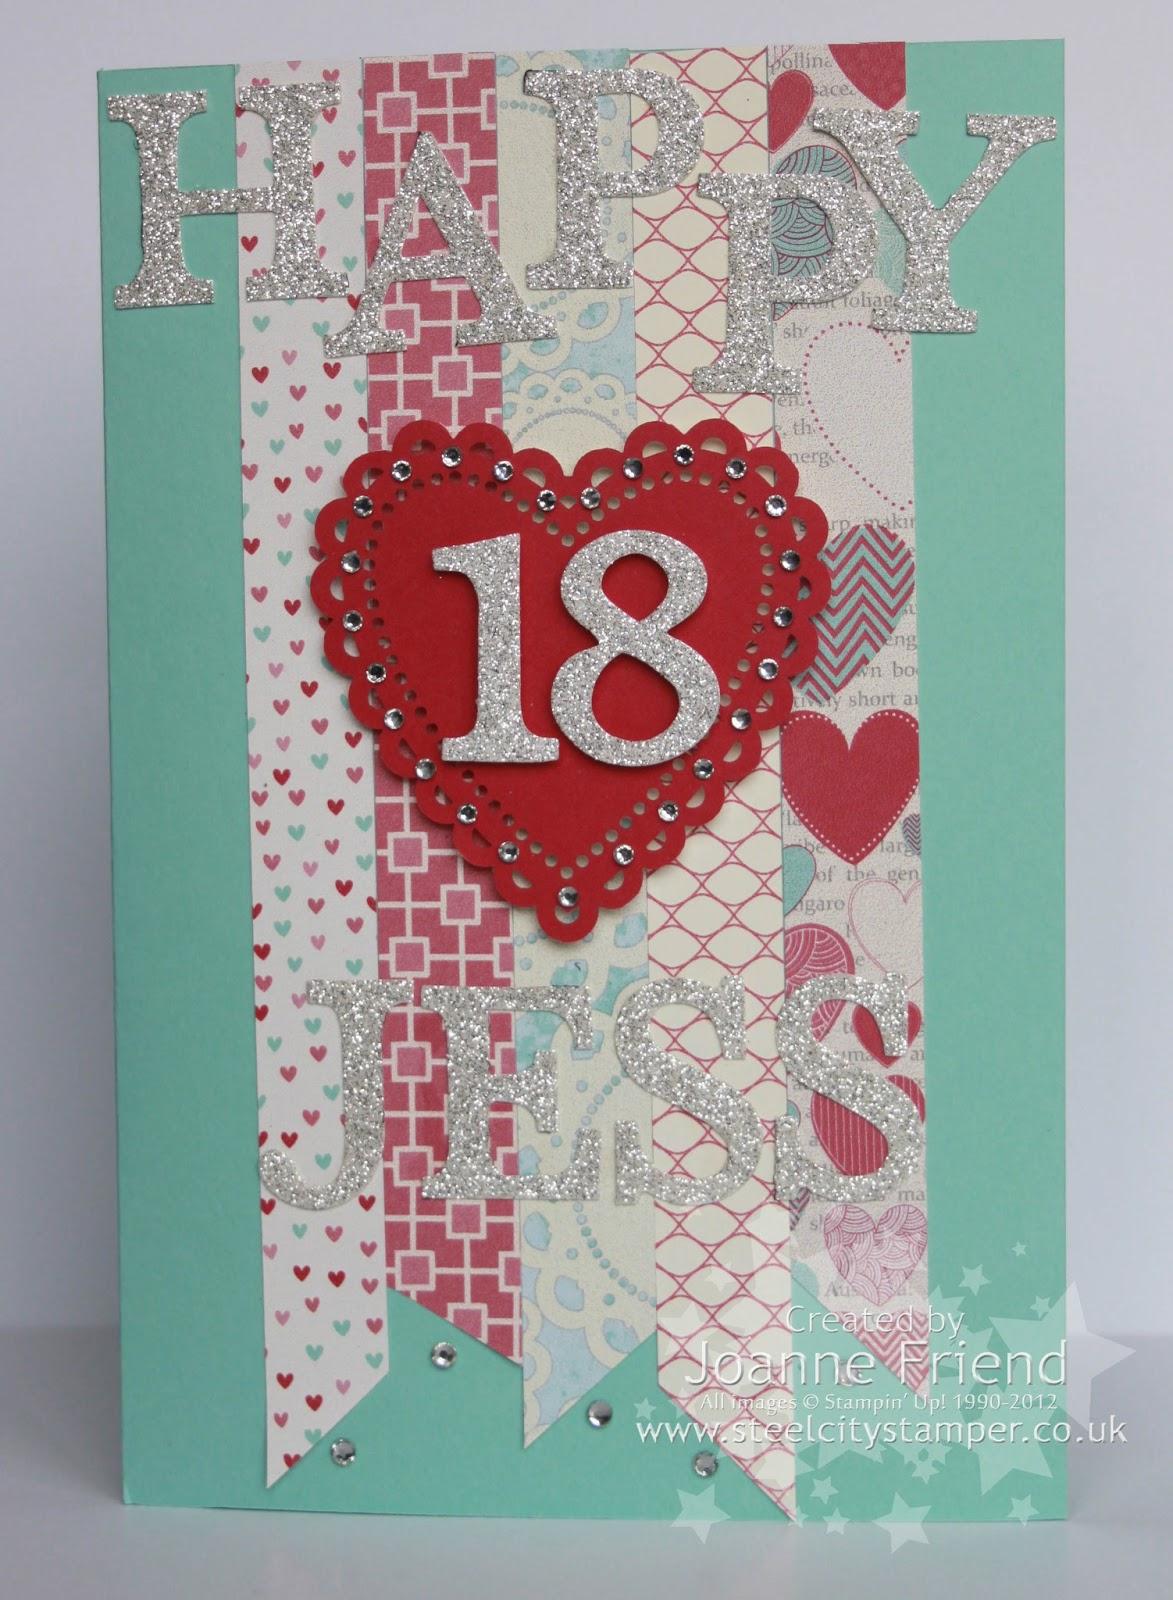 Steel City Stamper 18th Birthday Card